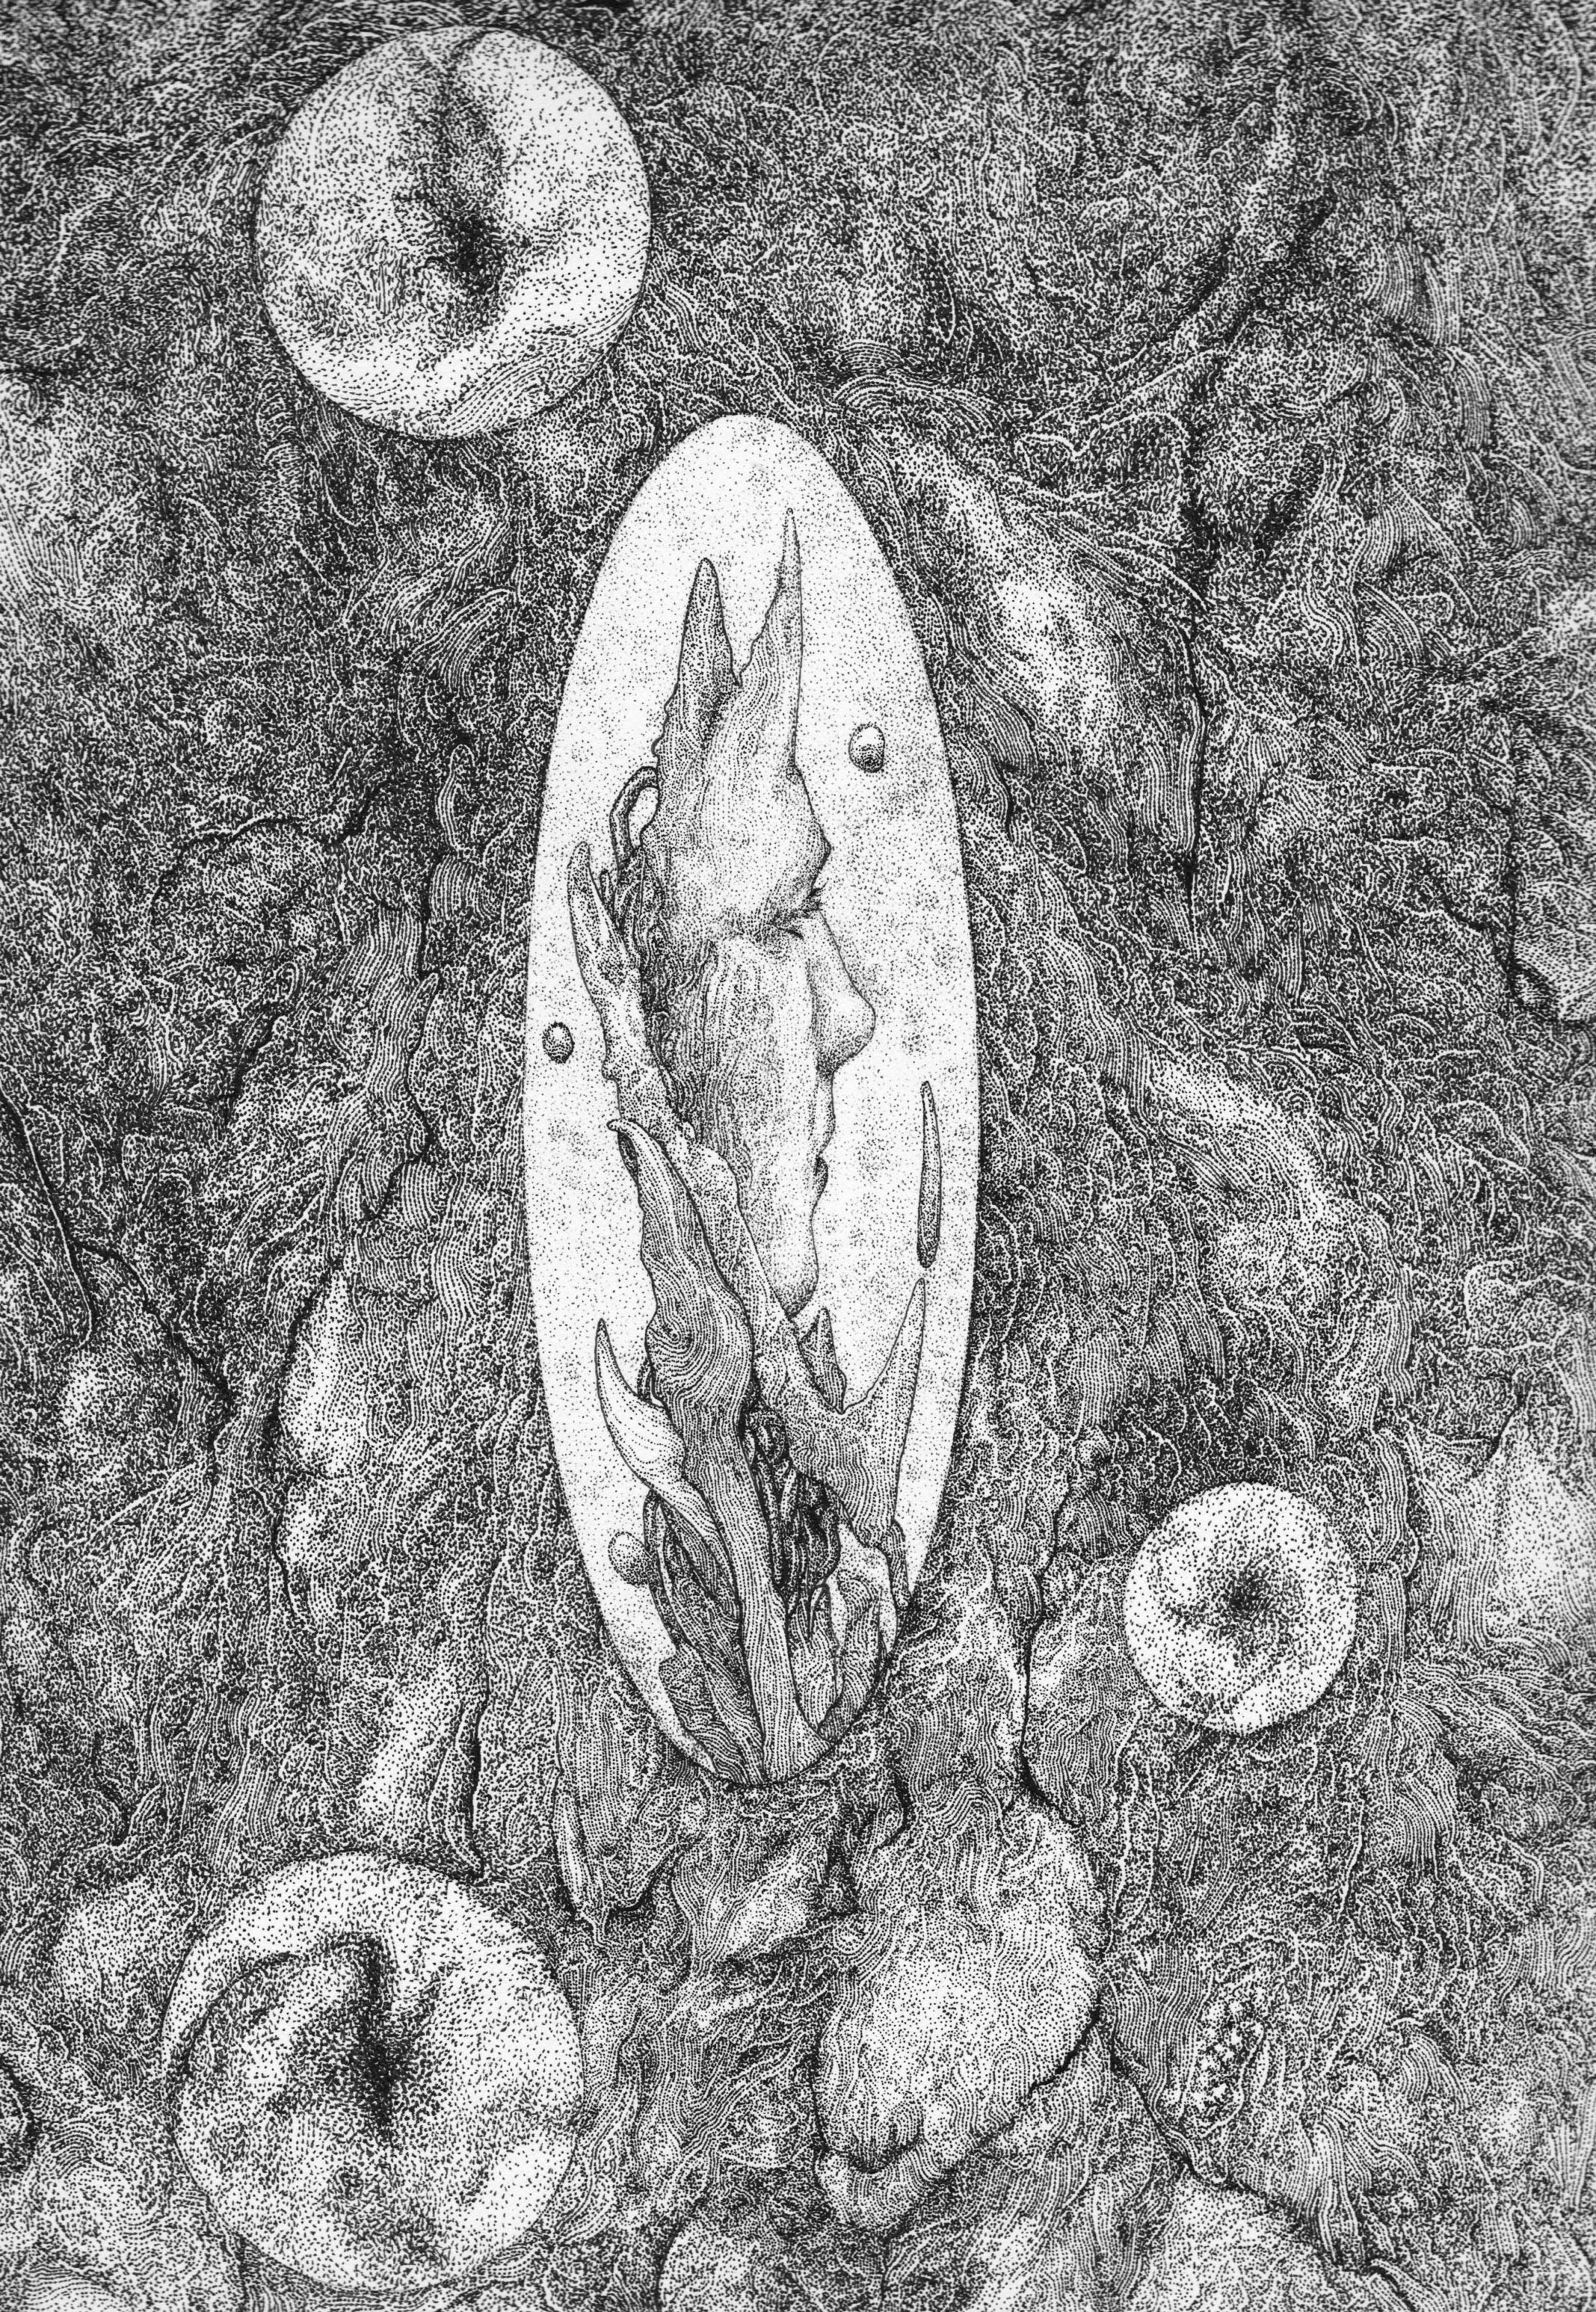 Wormhole V : Celestial Orifice